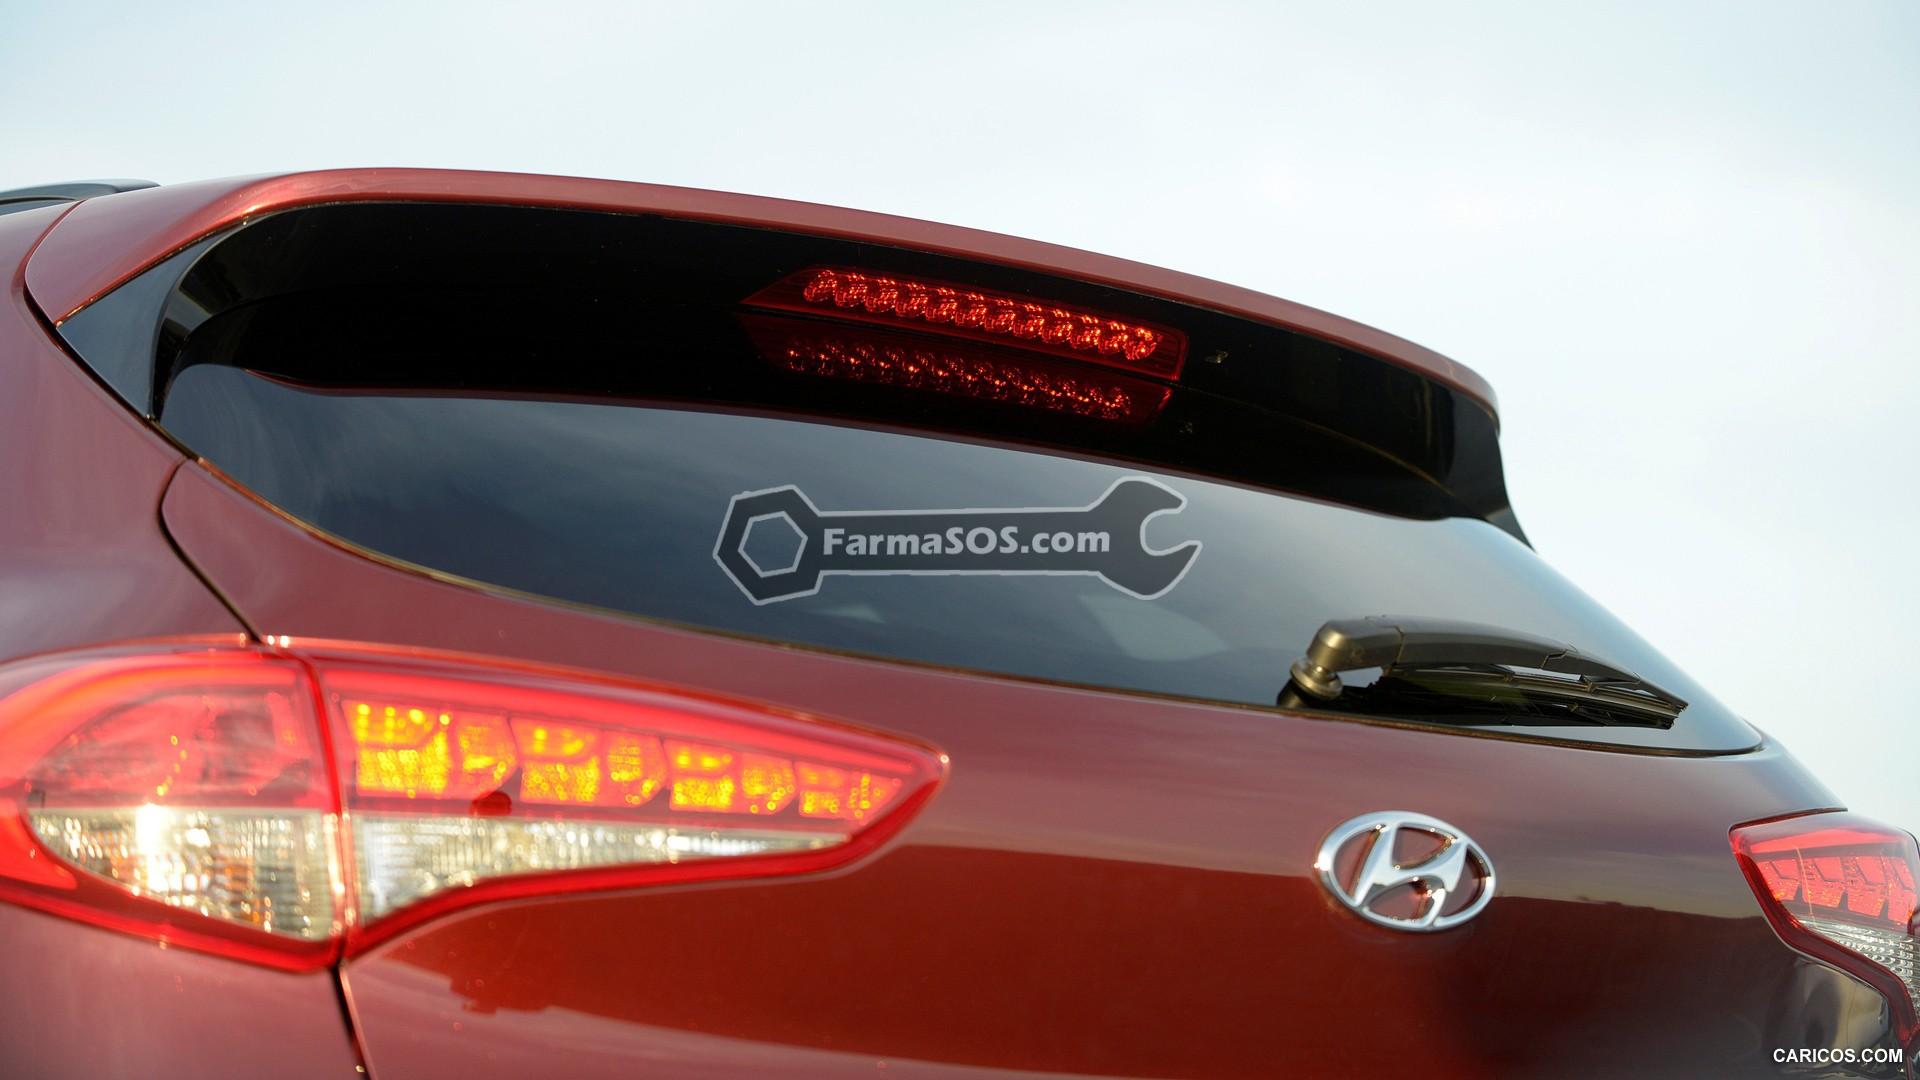 Hyundai Tucson 2015 2017 4 تصاویر هیوندای توسان مدل 2016 تا 2018